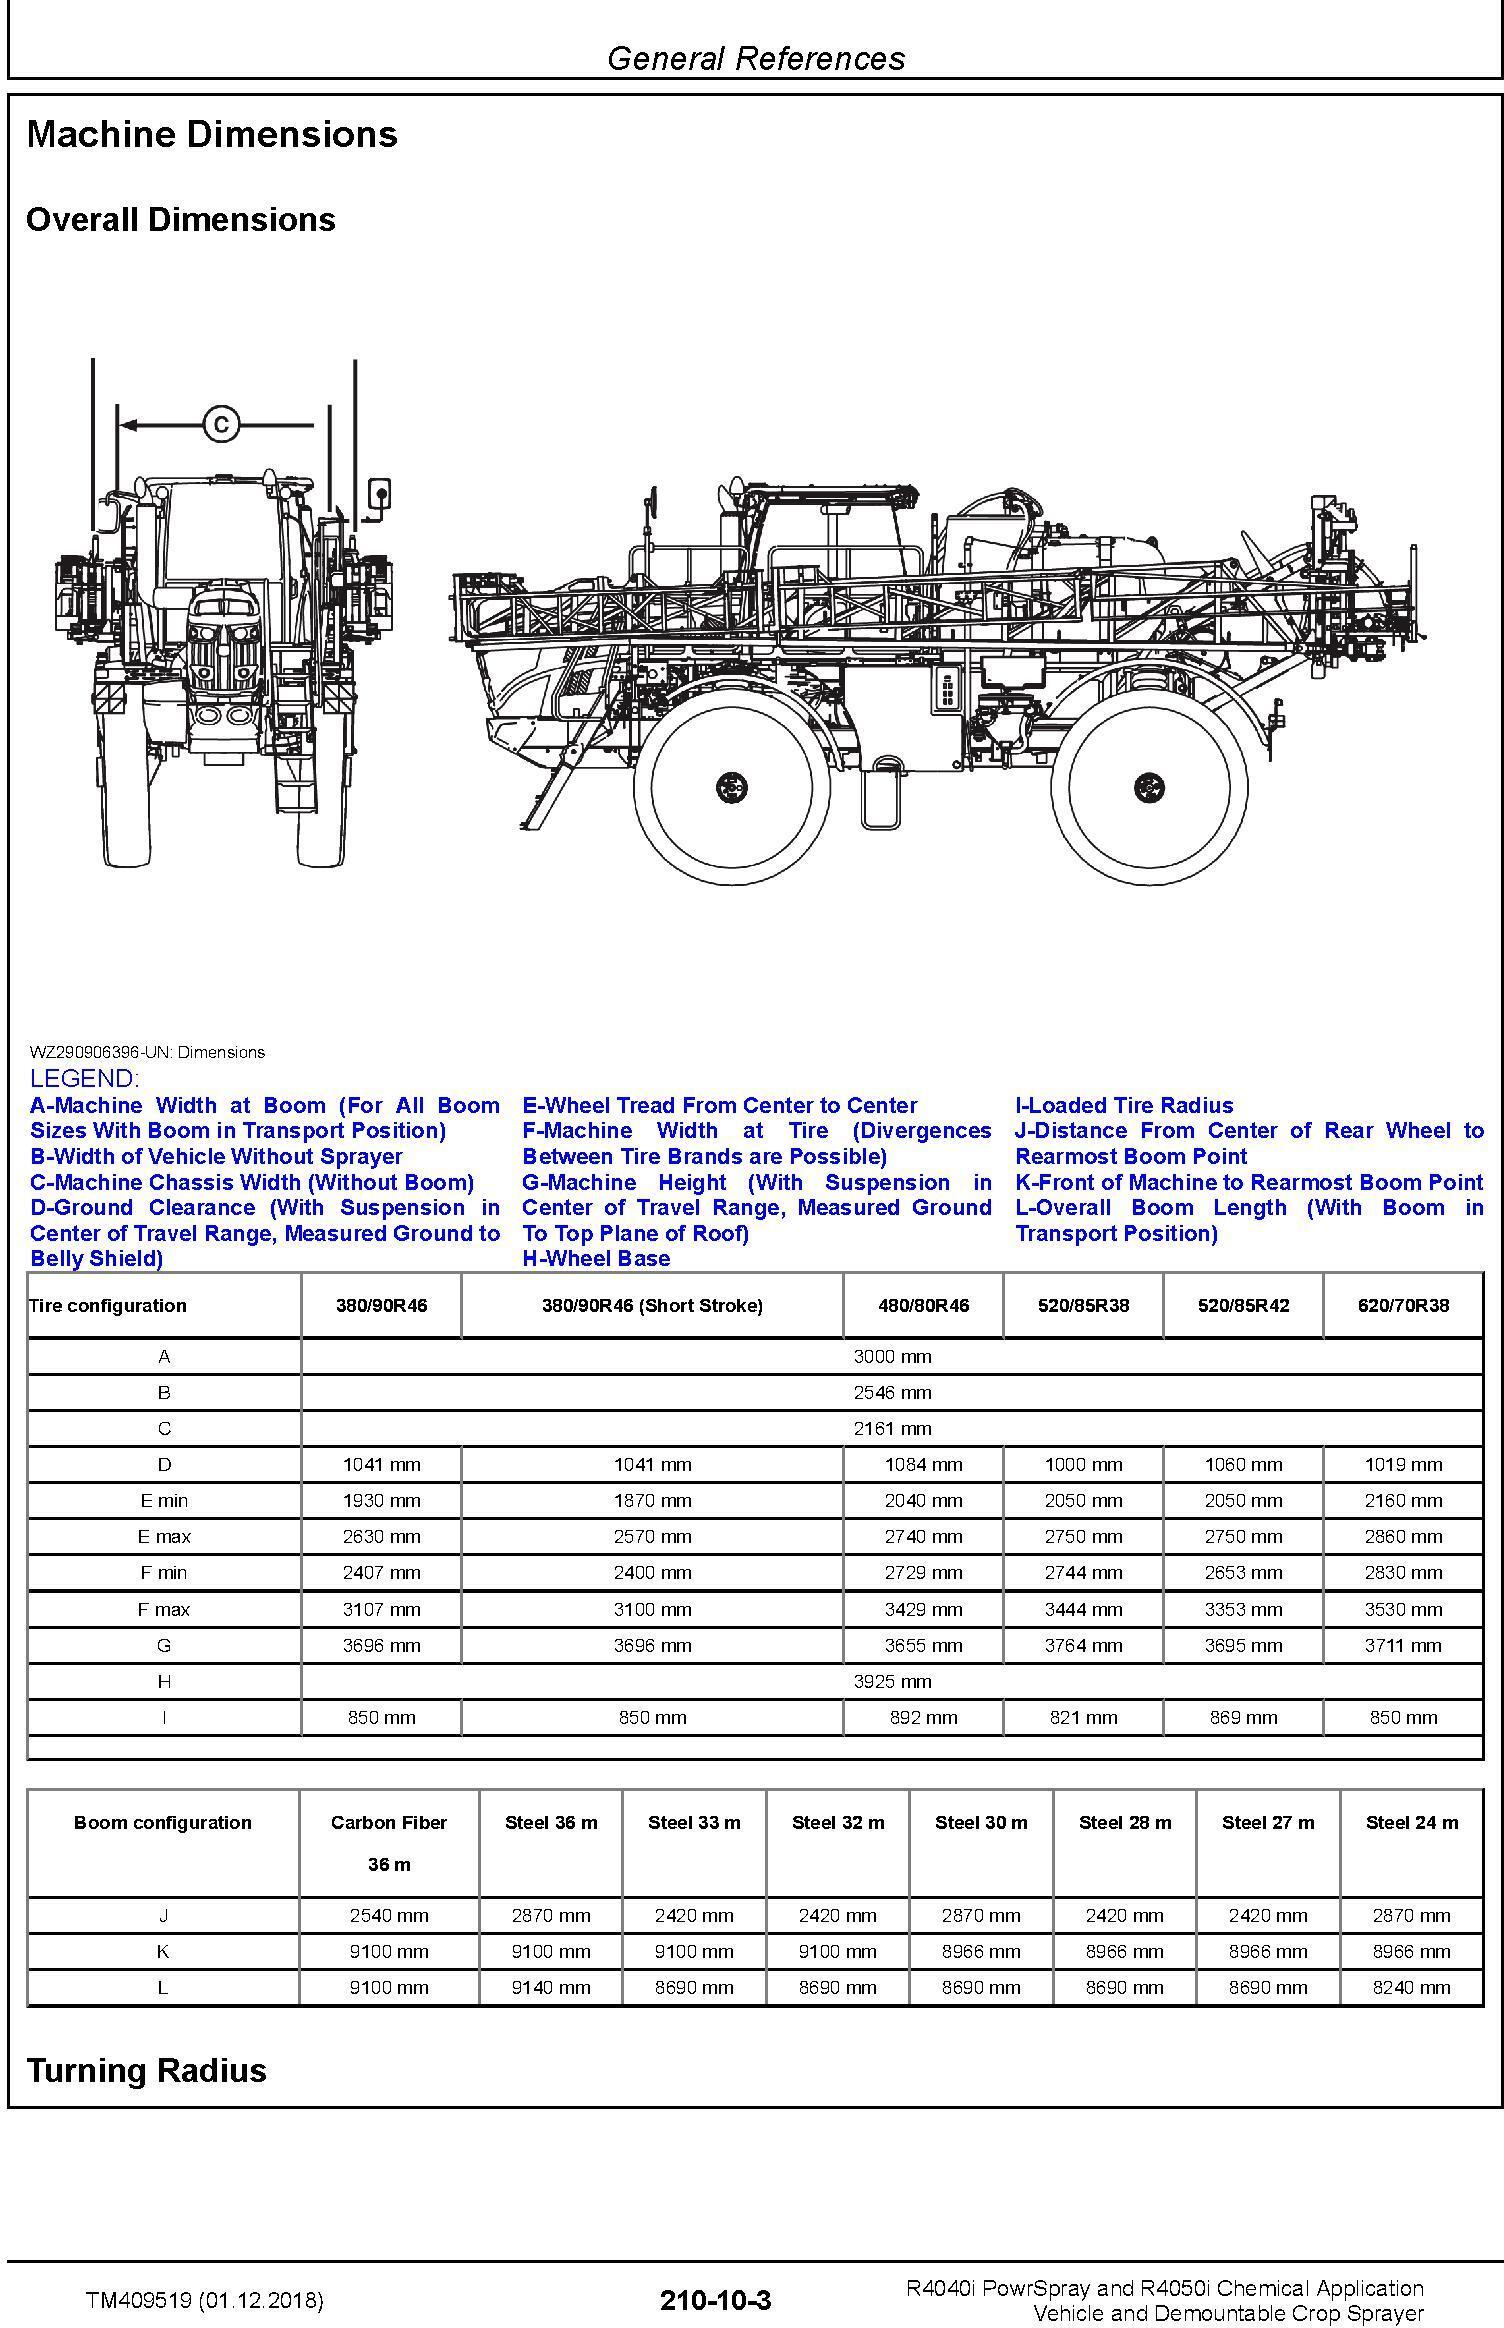 John Deere R4040i, R4050i Demountable Crop Sprayer (MY18) Diagnostic Technical Service Manual (TM409519) - 1